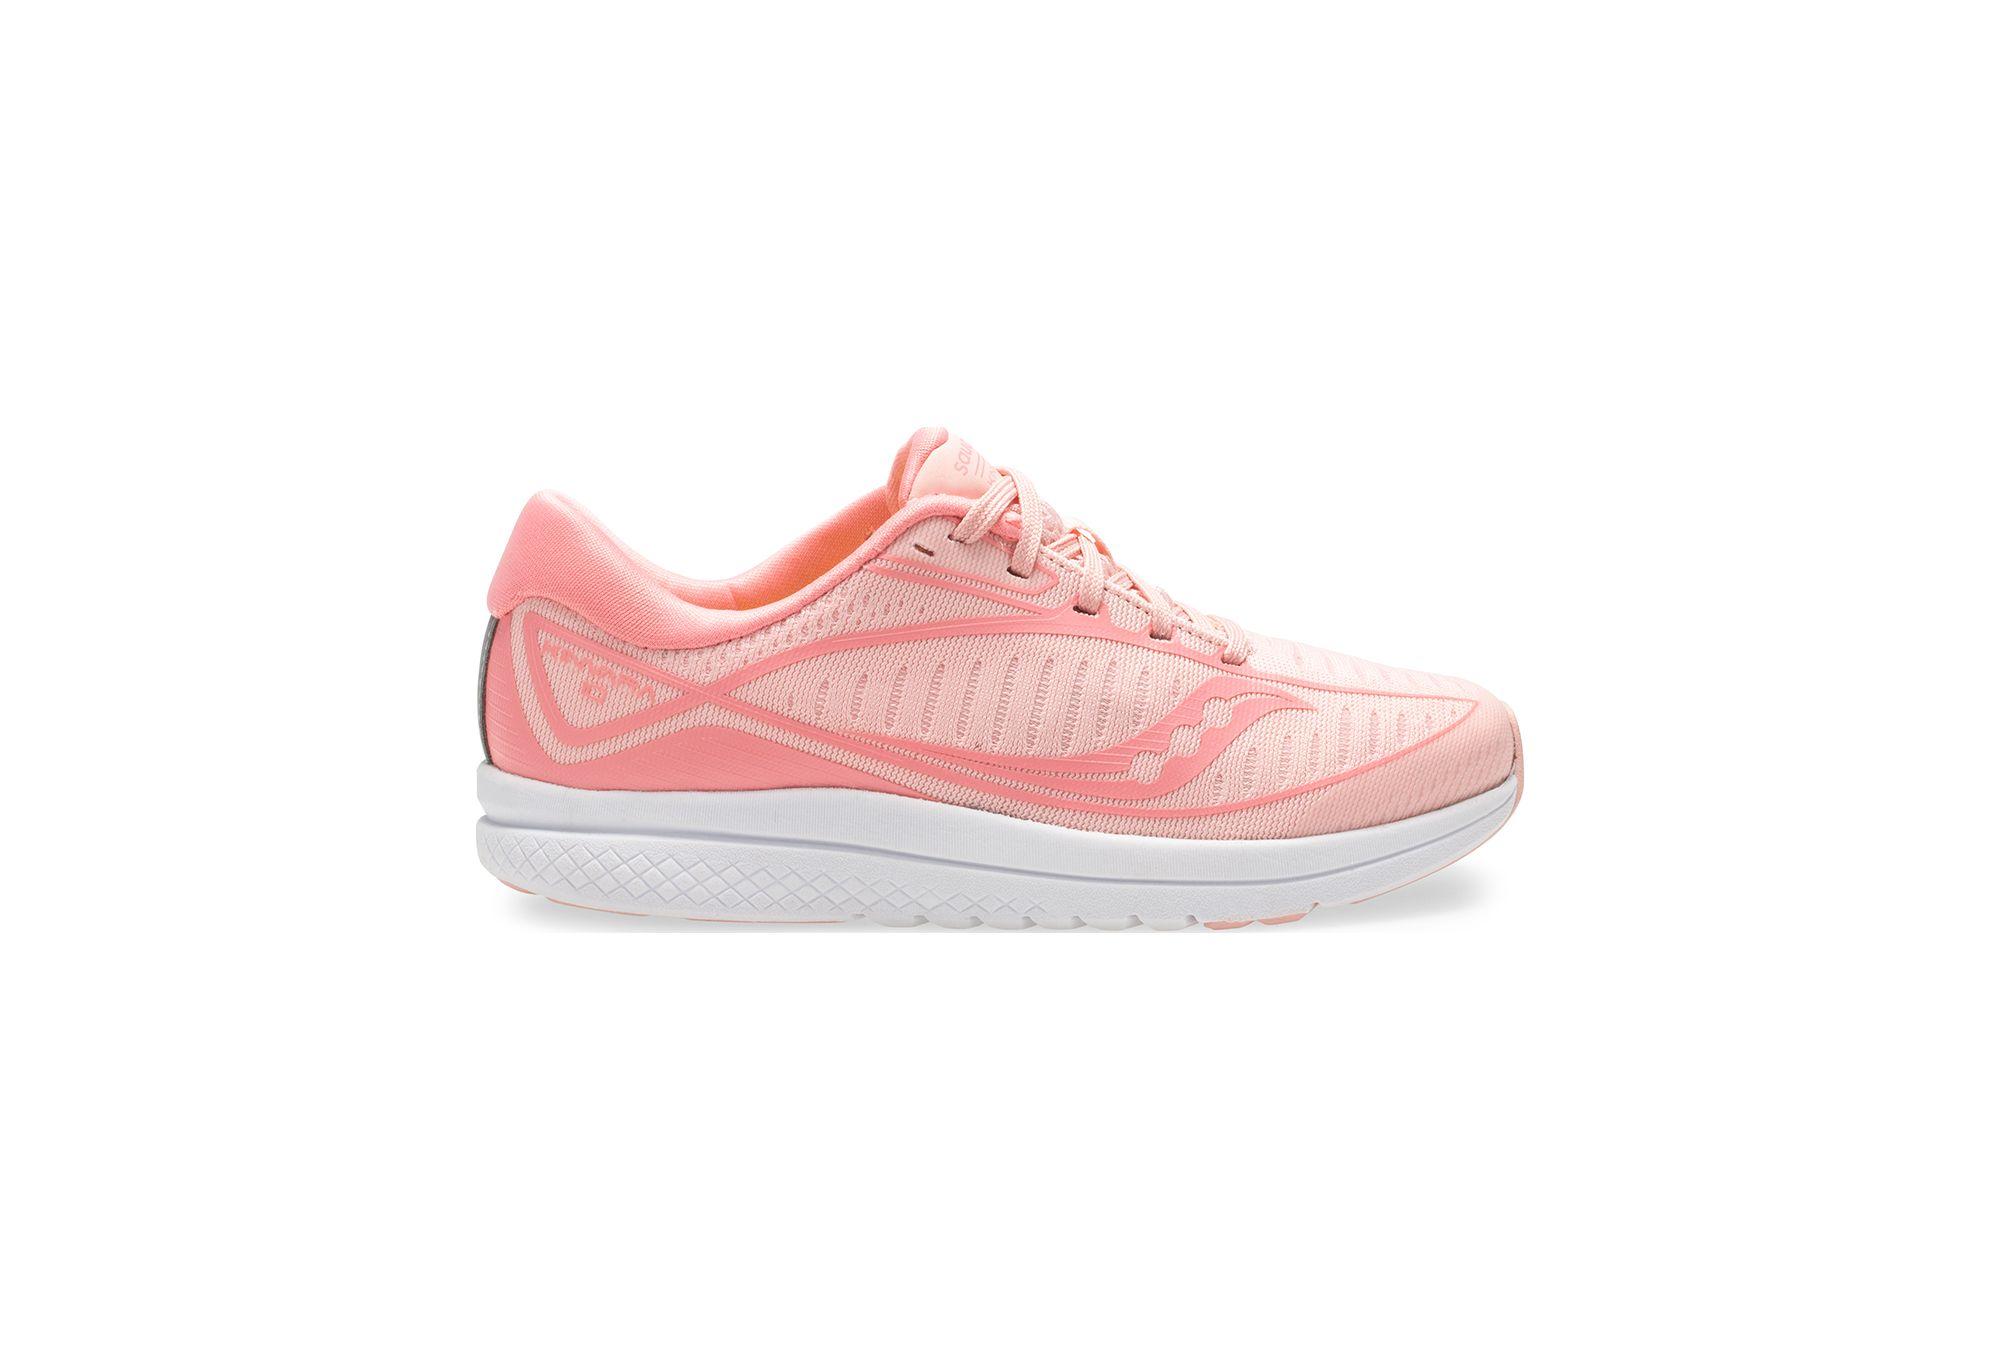 5599527db1b41 Saucony Kinvara 10 Women s Running Shoes Pink 32